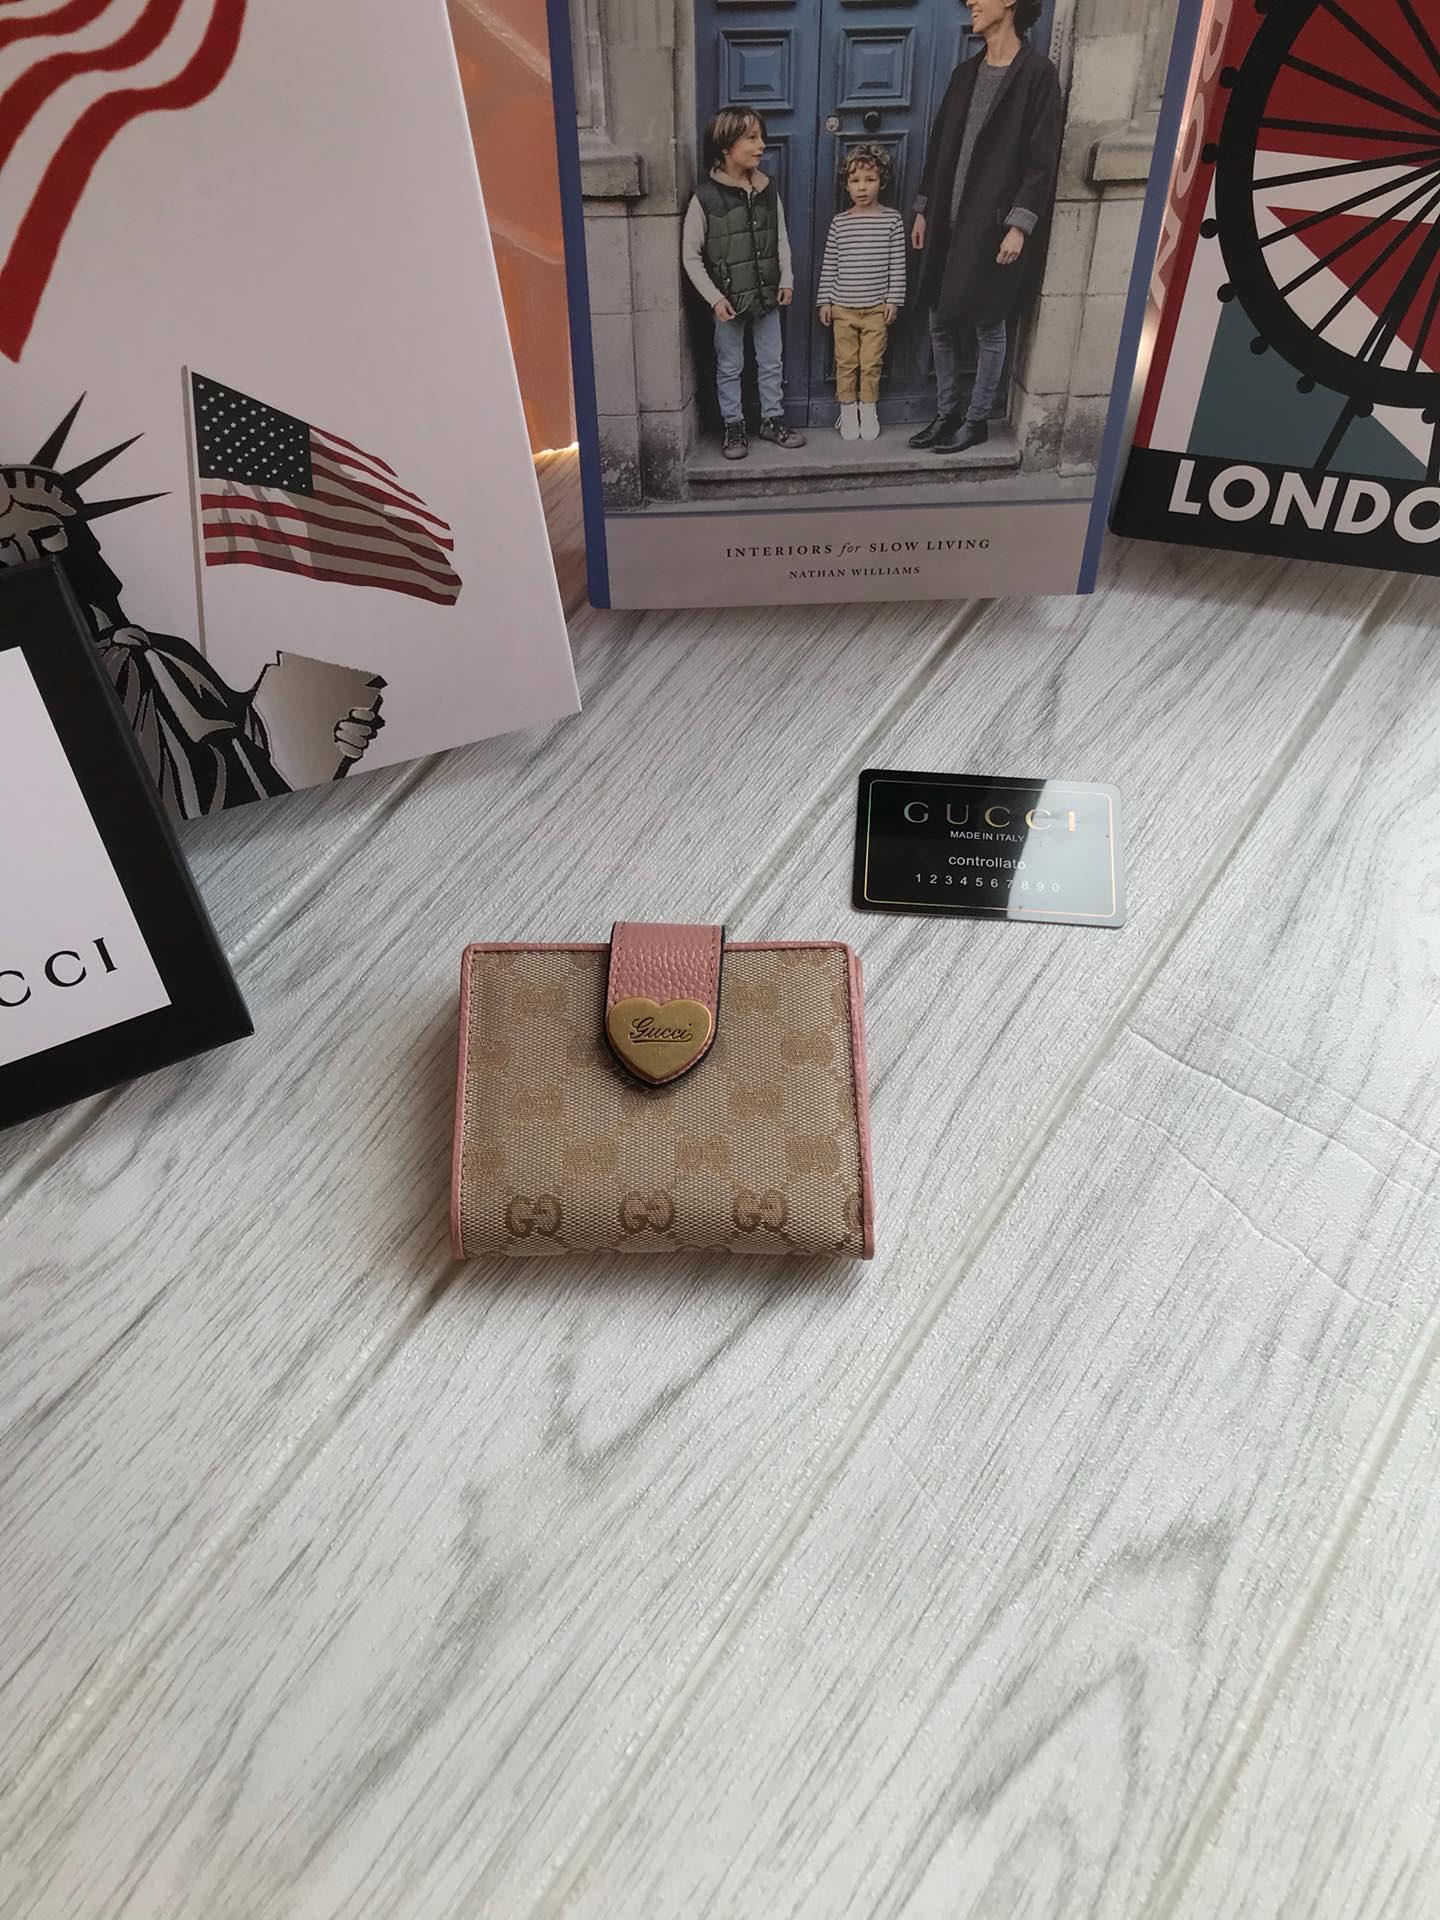 Gucci グッチ レディース 三つ折り財布 代金引換国内 4色